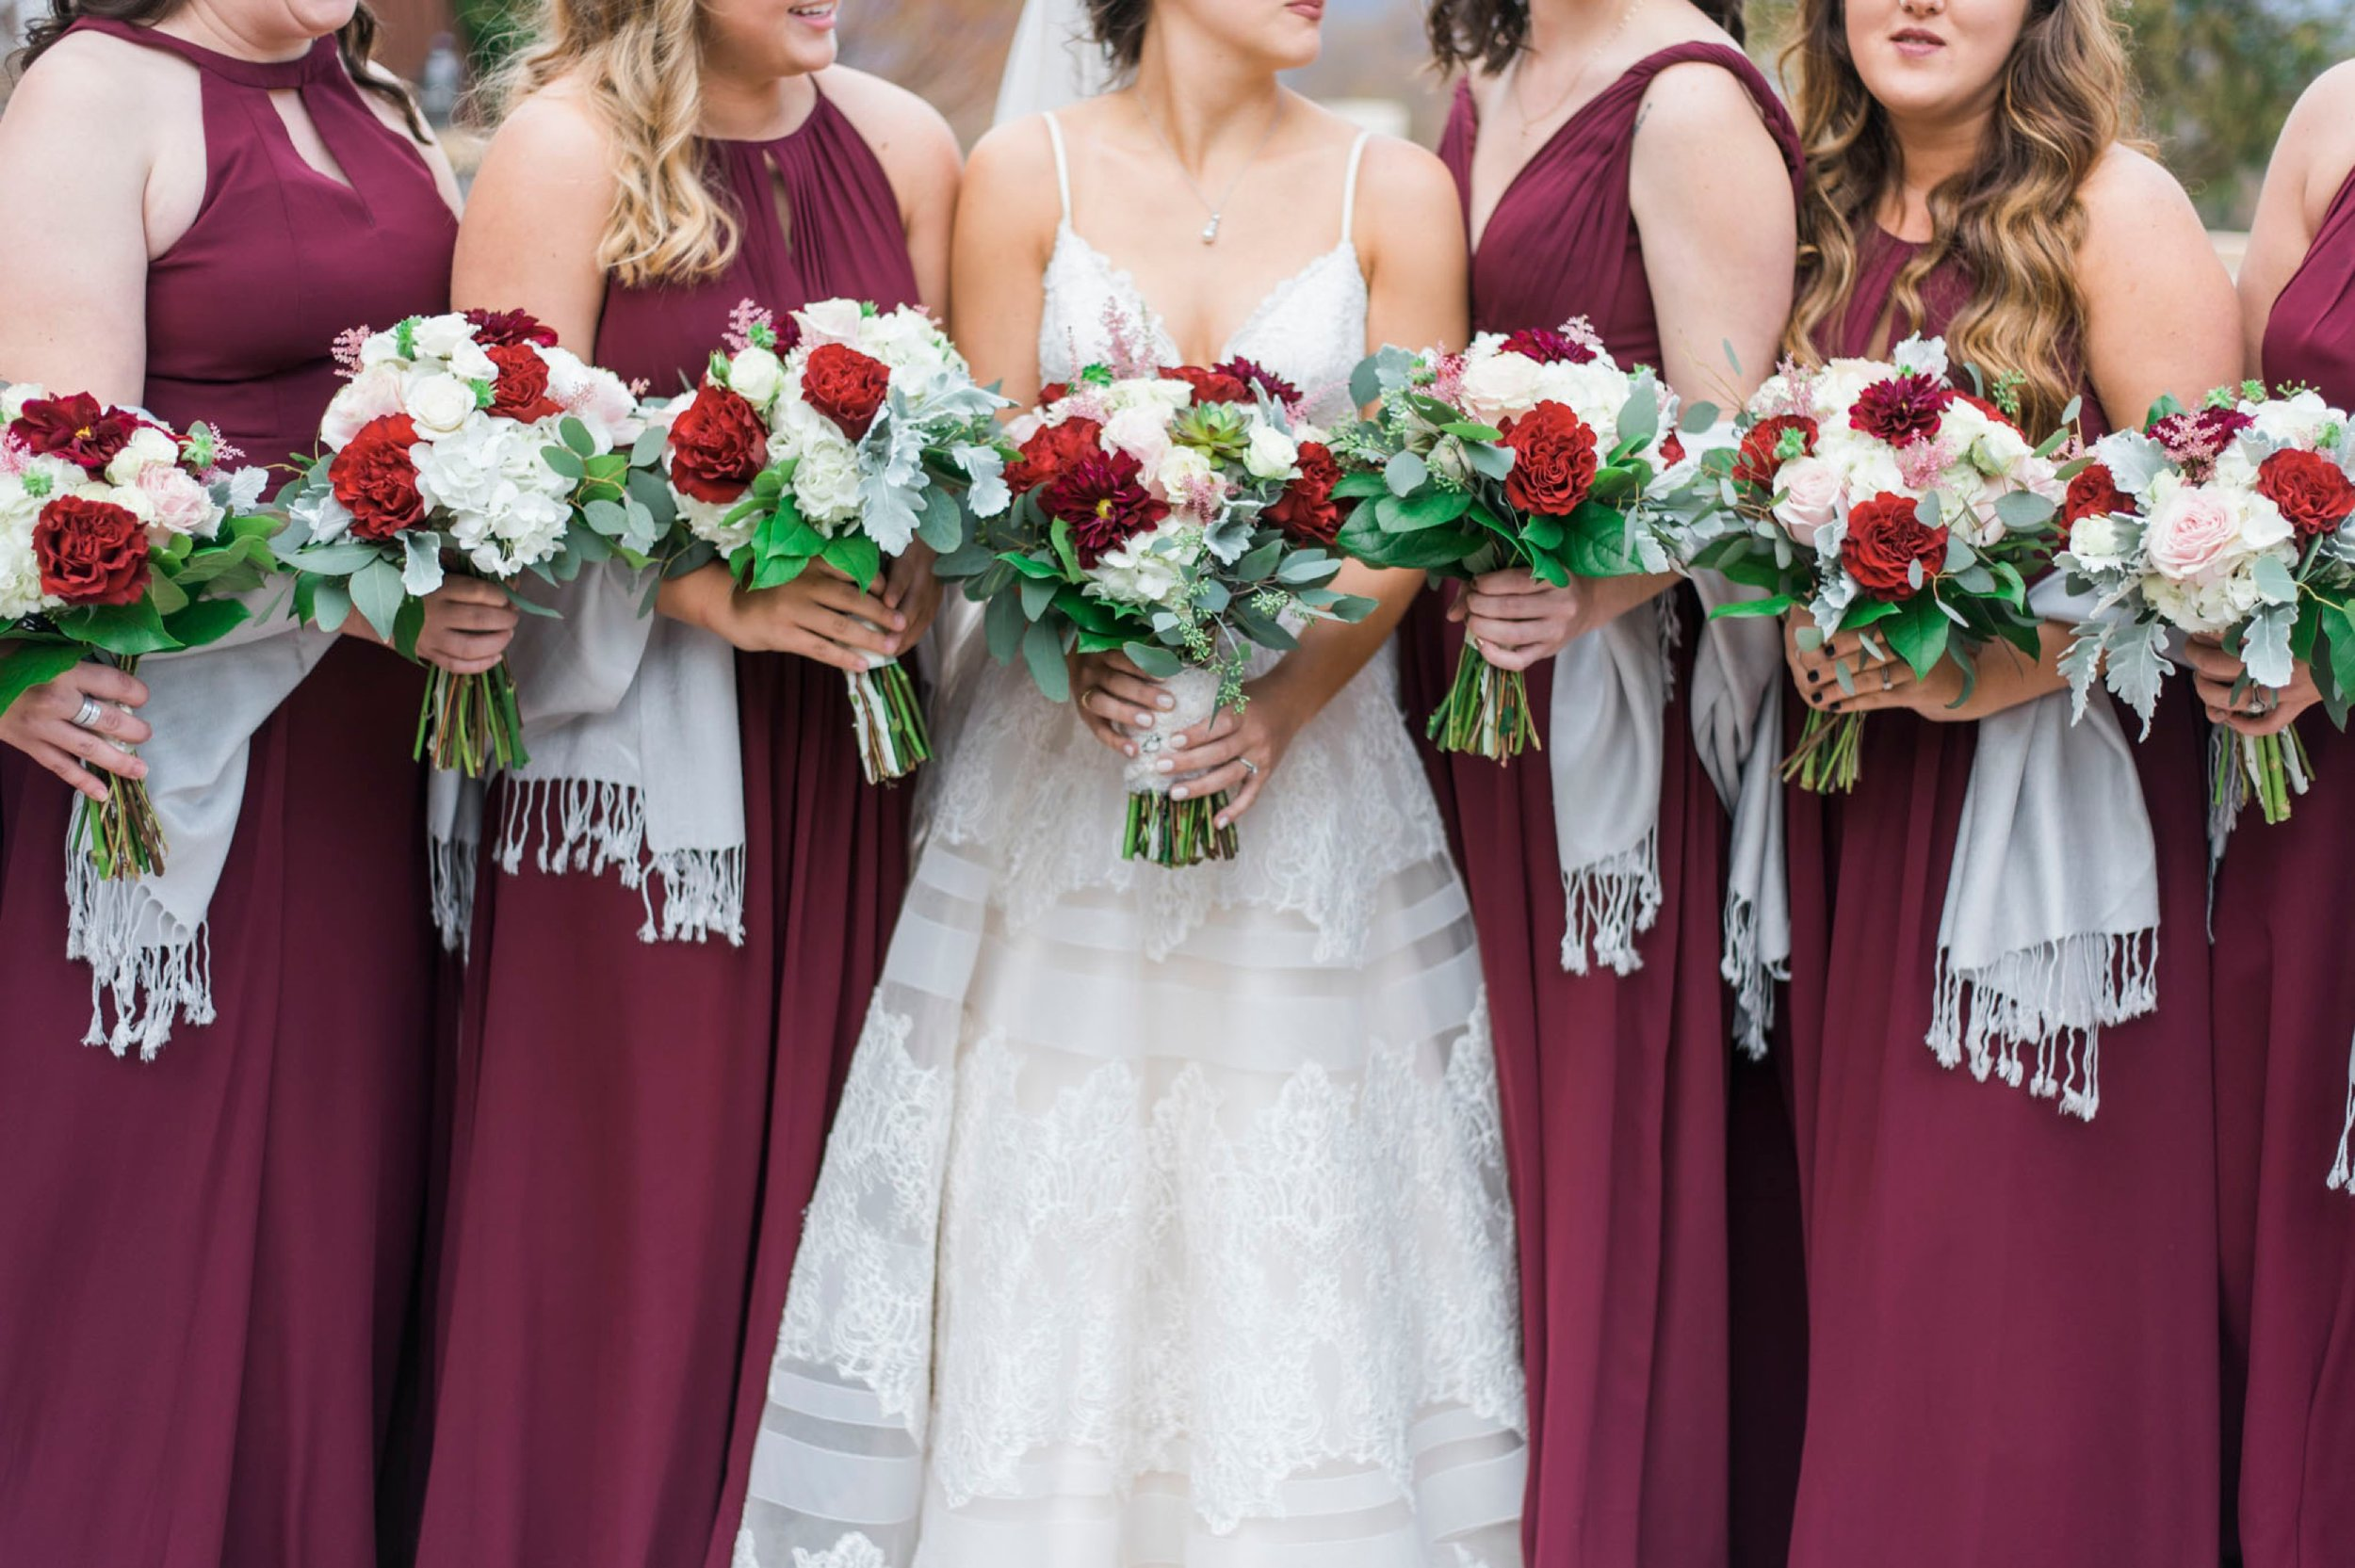 IrvineEstate_LexingtonVA_Wedding_FallWedding_VirginiaWeddingPhotographer 39.jpg